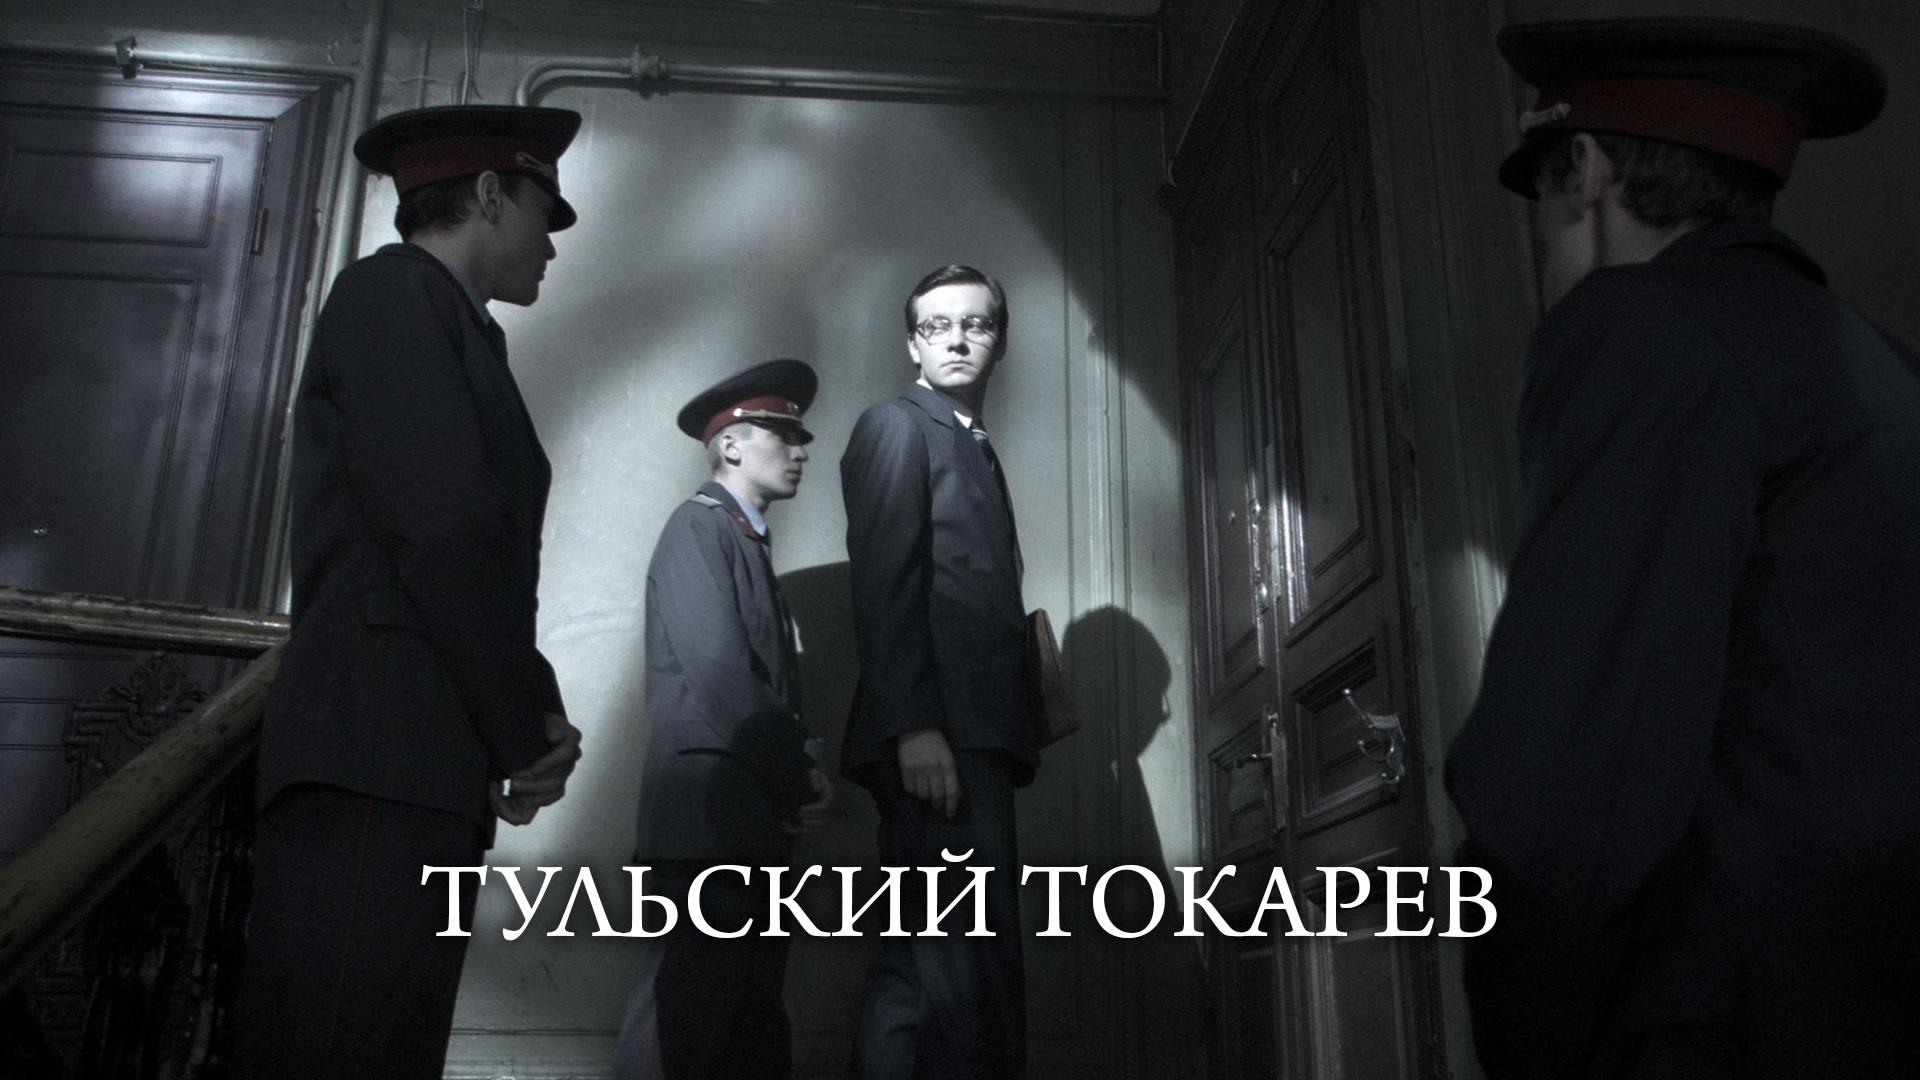 Тульский Токарев (12 серий) (2010)